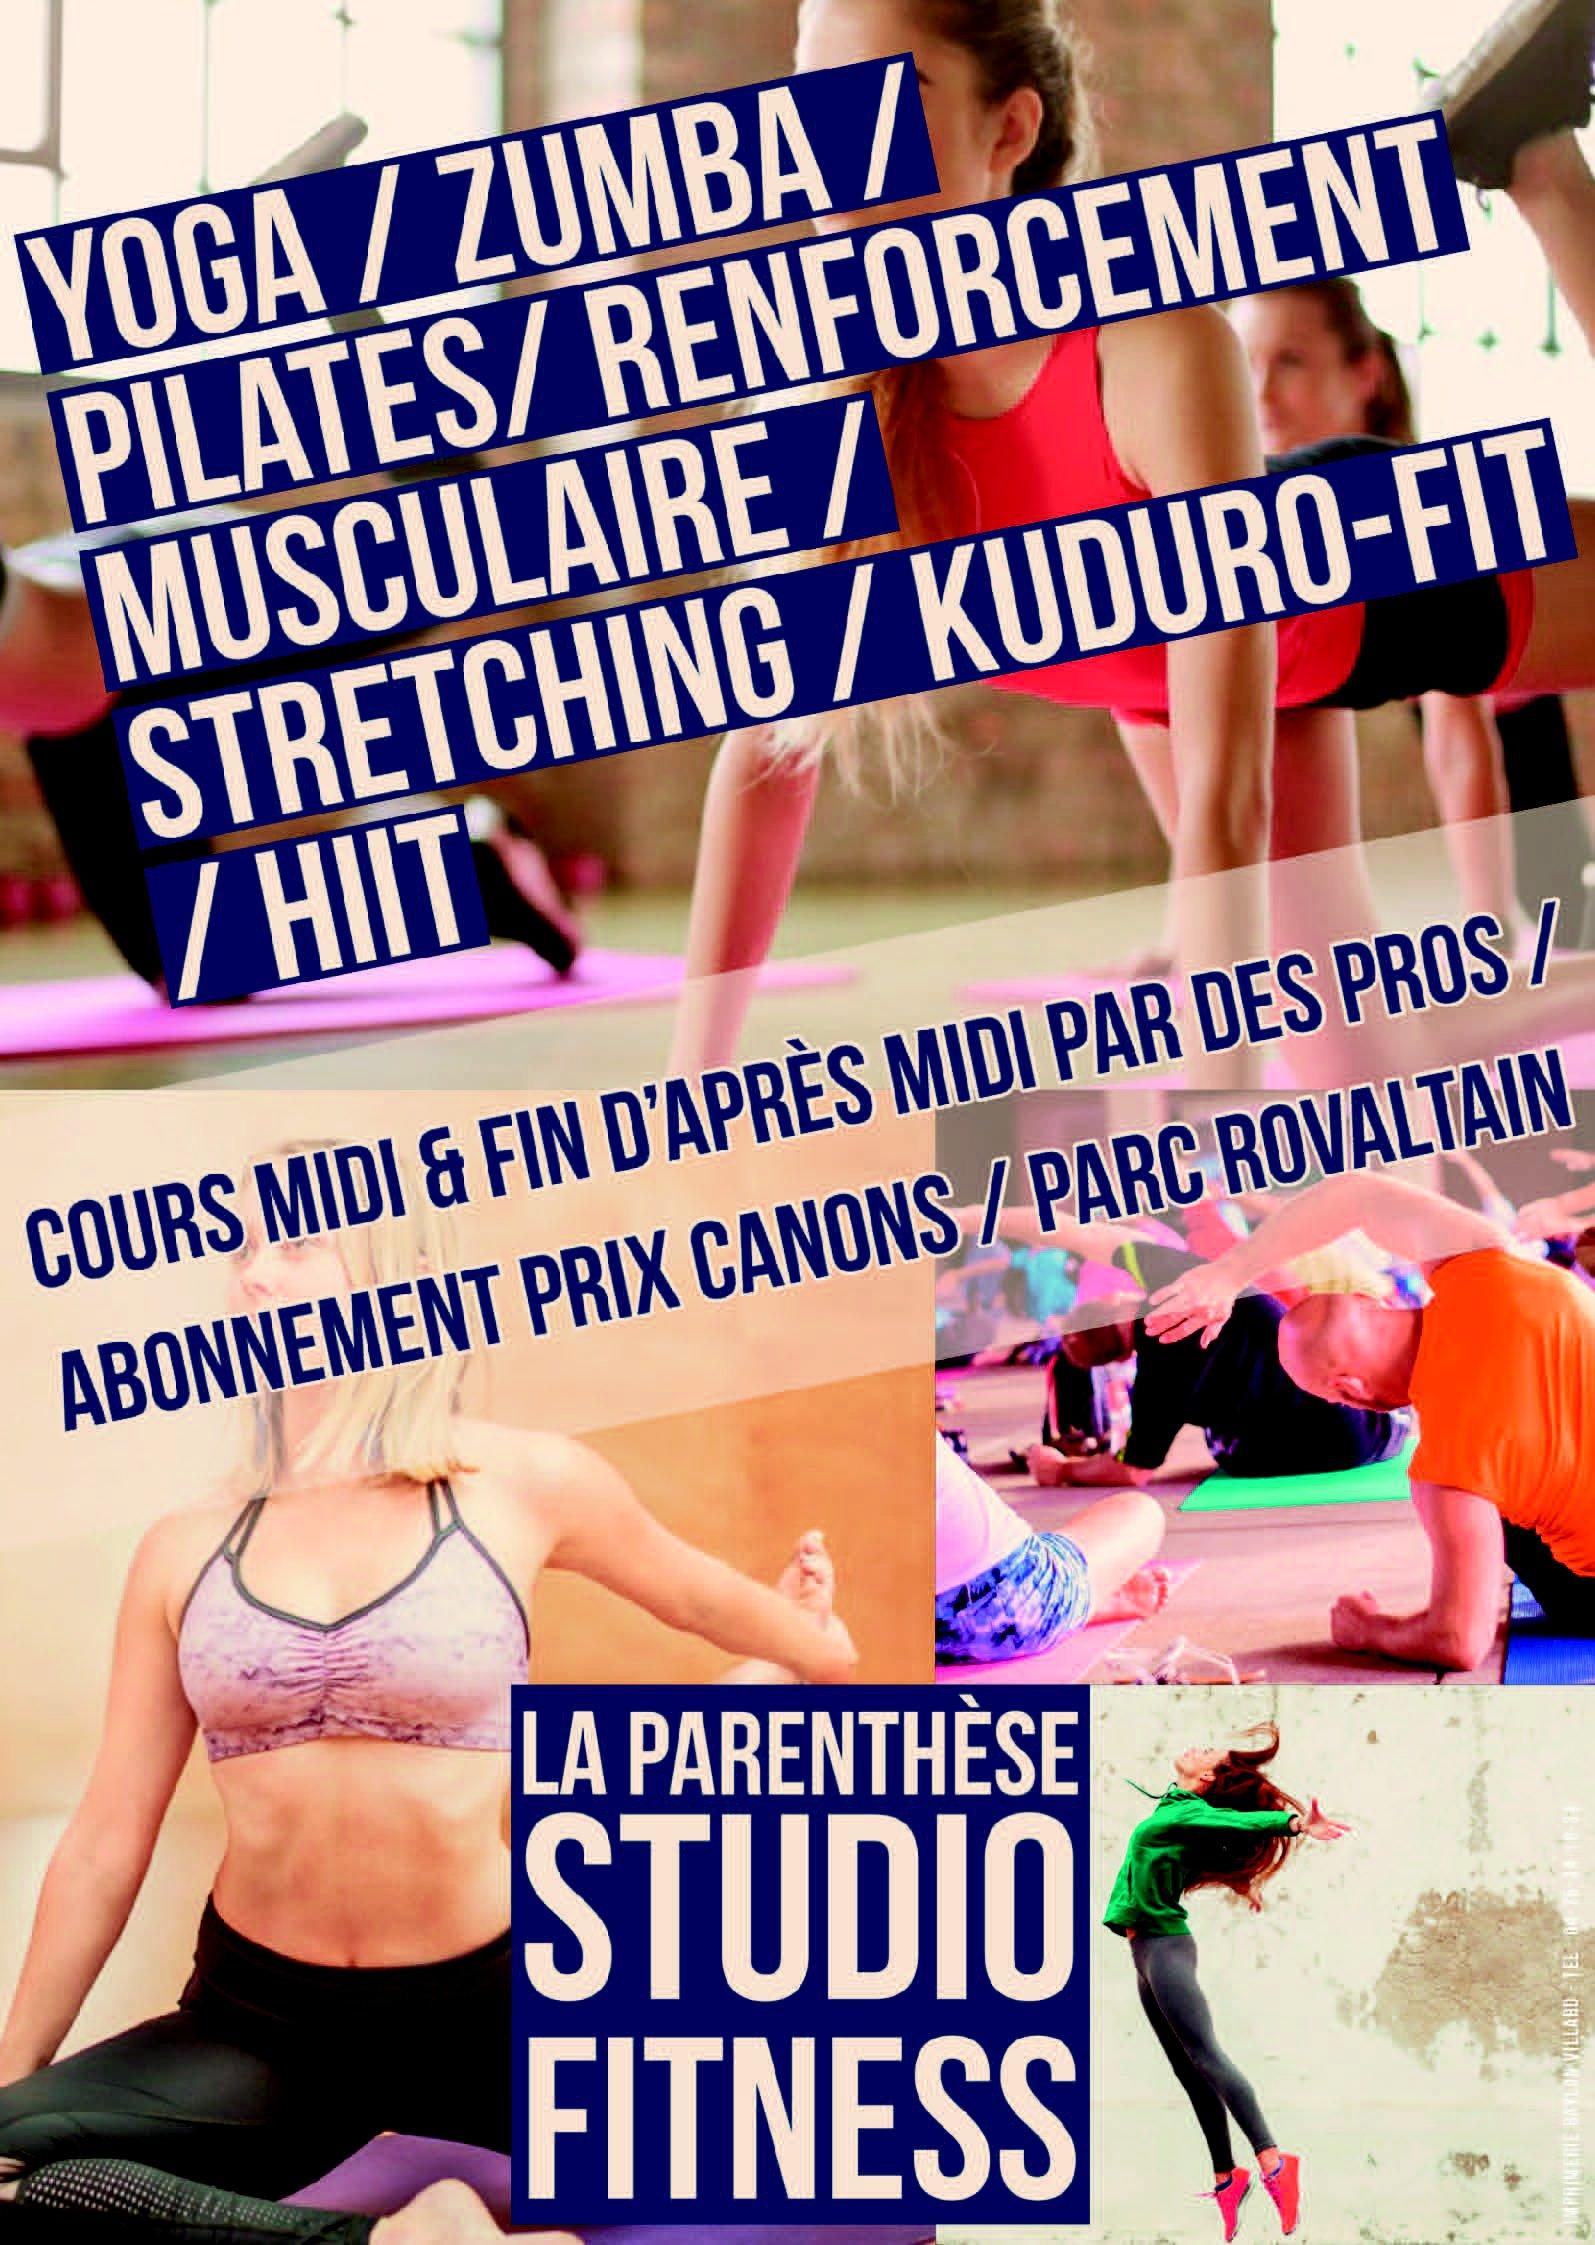 Programme Studio Fitness - affiche.JPG